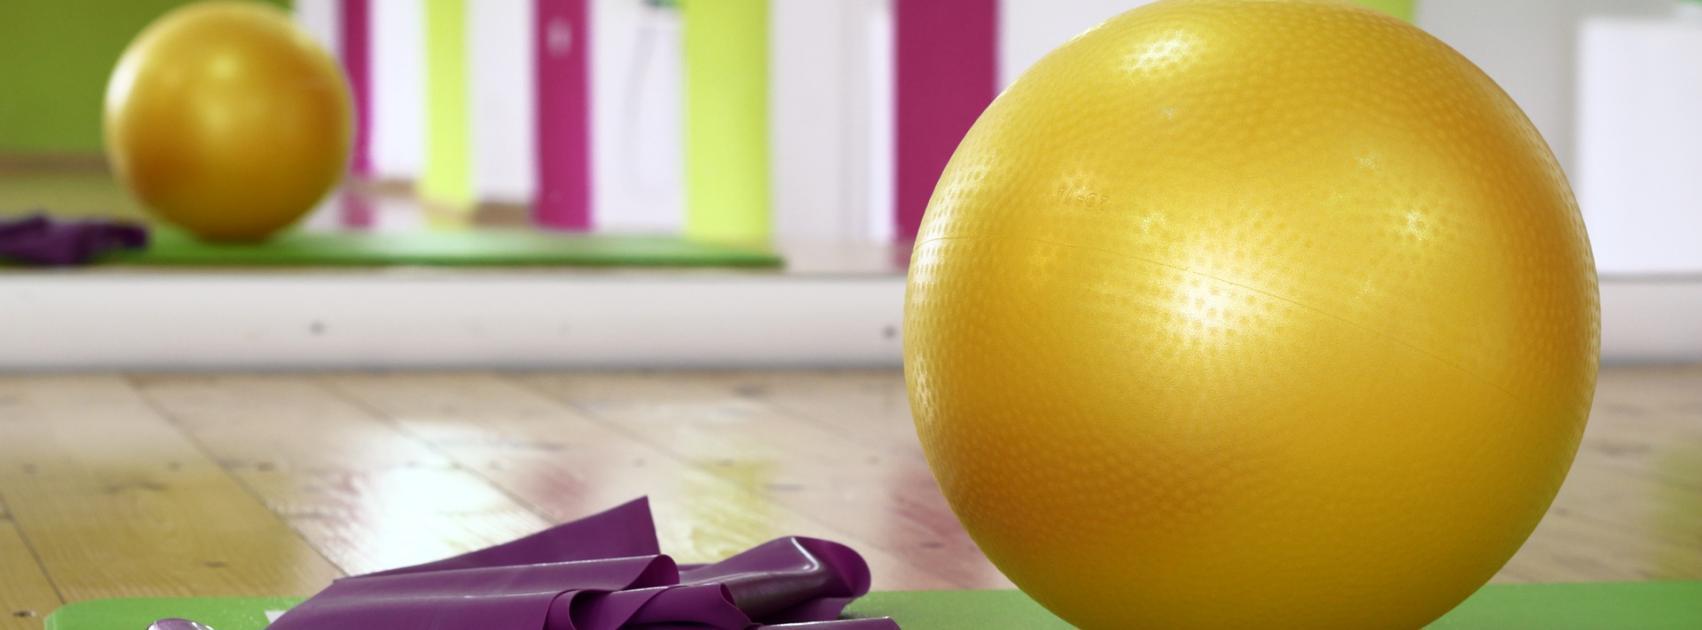 workout-1931107_1920_0.jpg